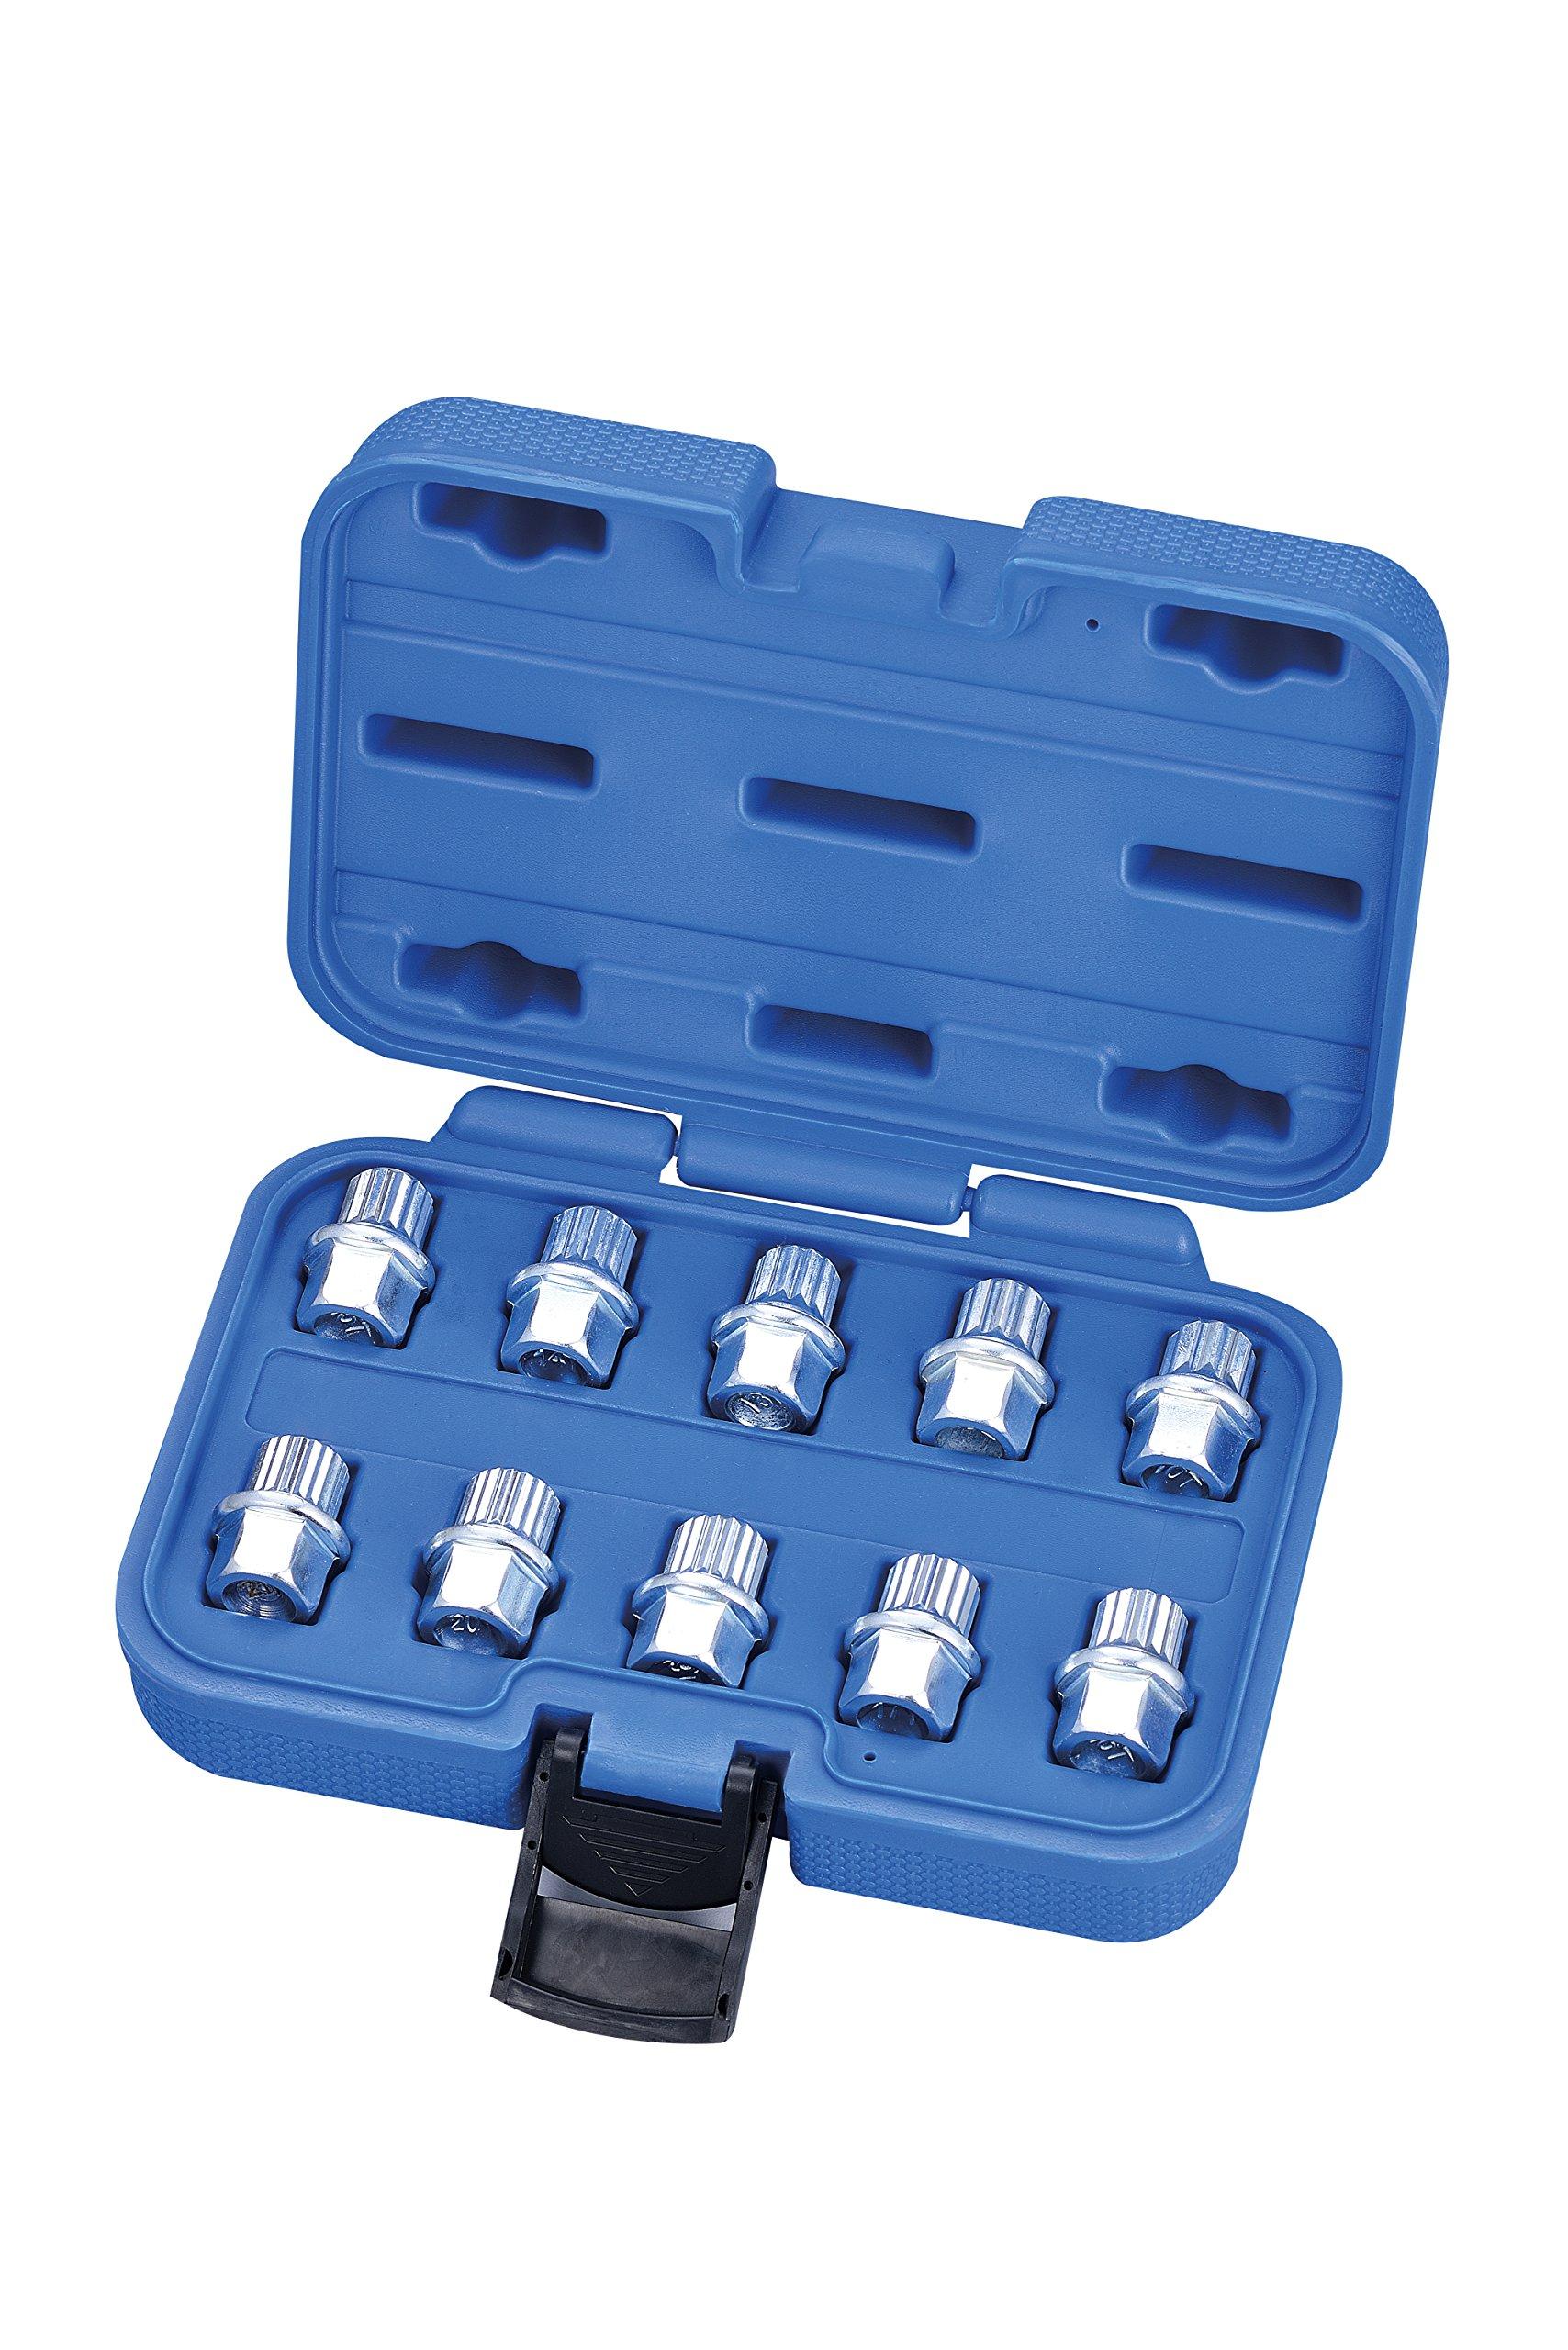 kauplus 10PCS Lug Nuts, Wheel Lock Key- Anti Theft Wheel Lock Key Set for Cars Wheel Tire Nut Screw Removal by kauplus